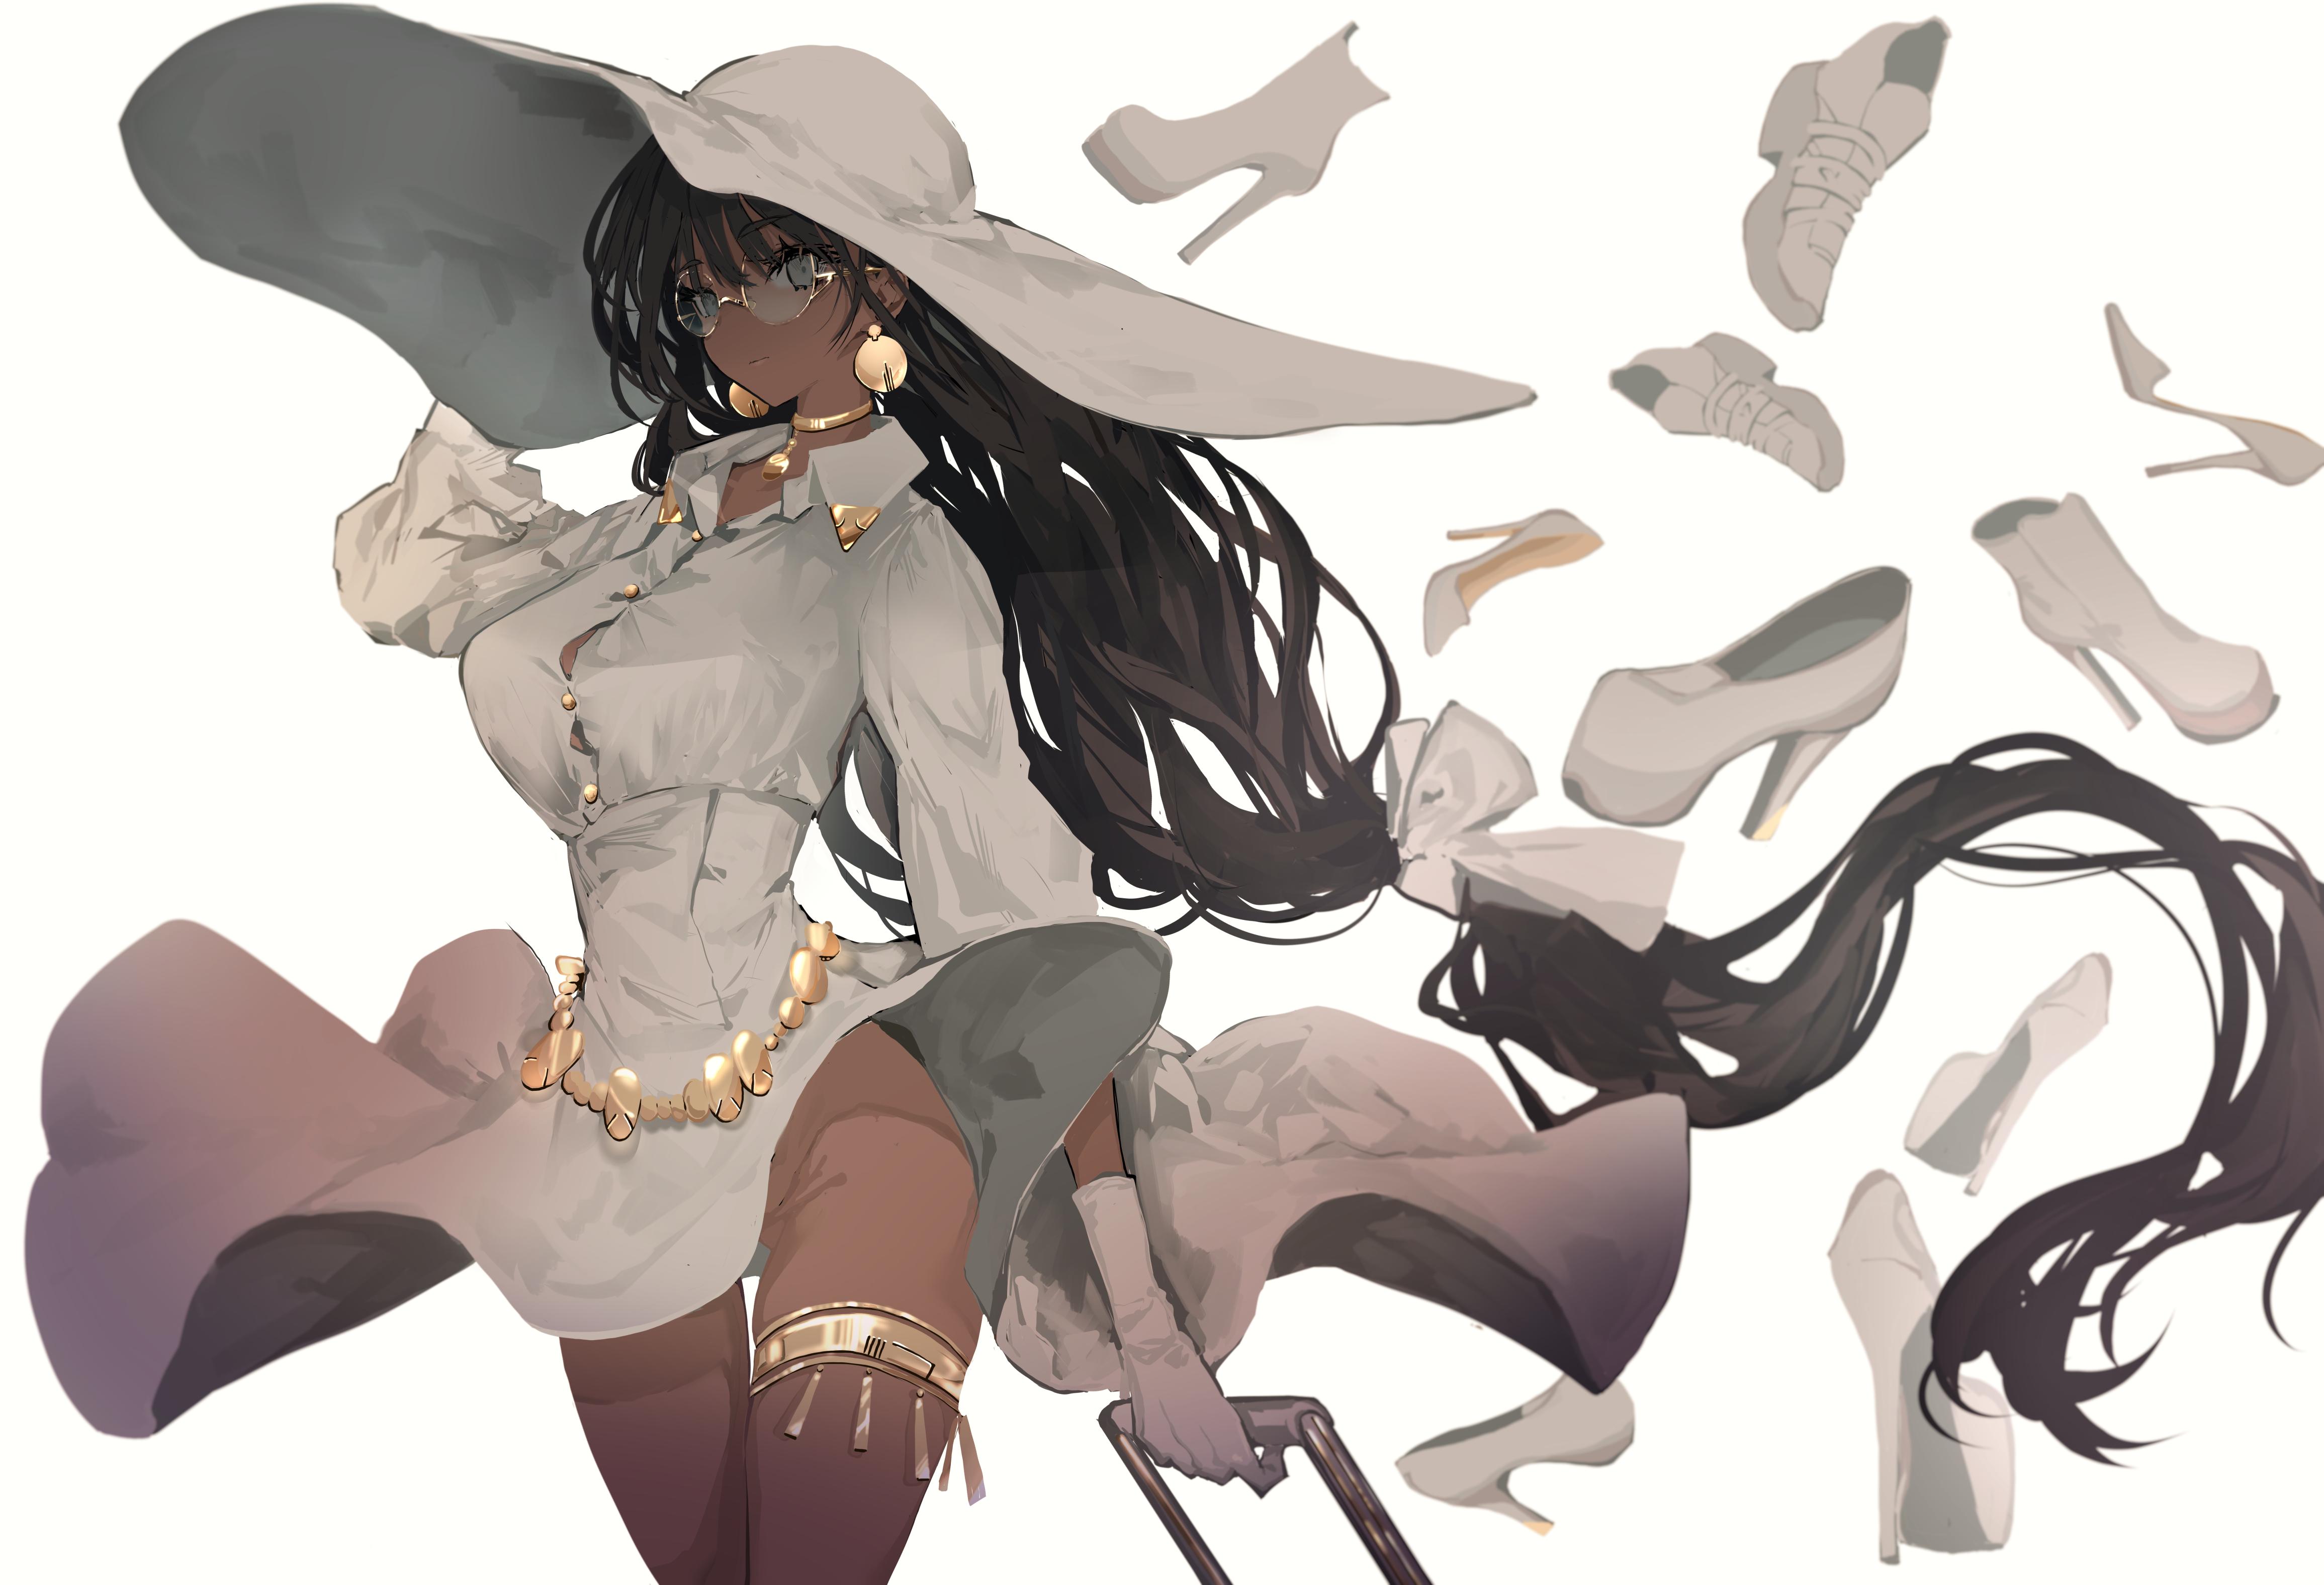 【P站画师】日本画师なるゑ的最新插画作品- ACG17.COM